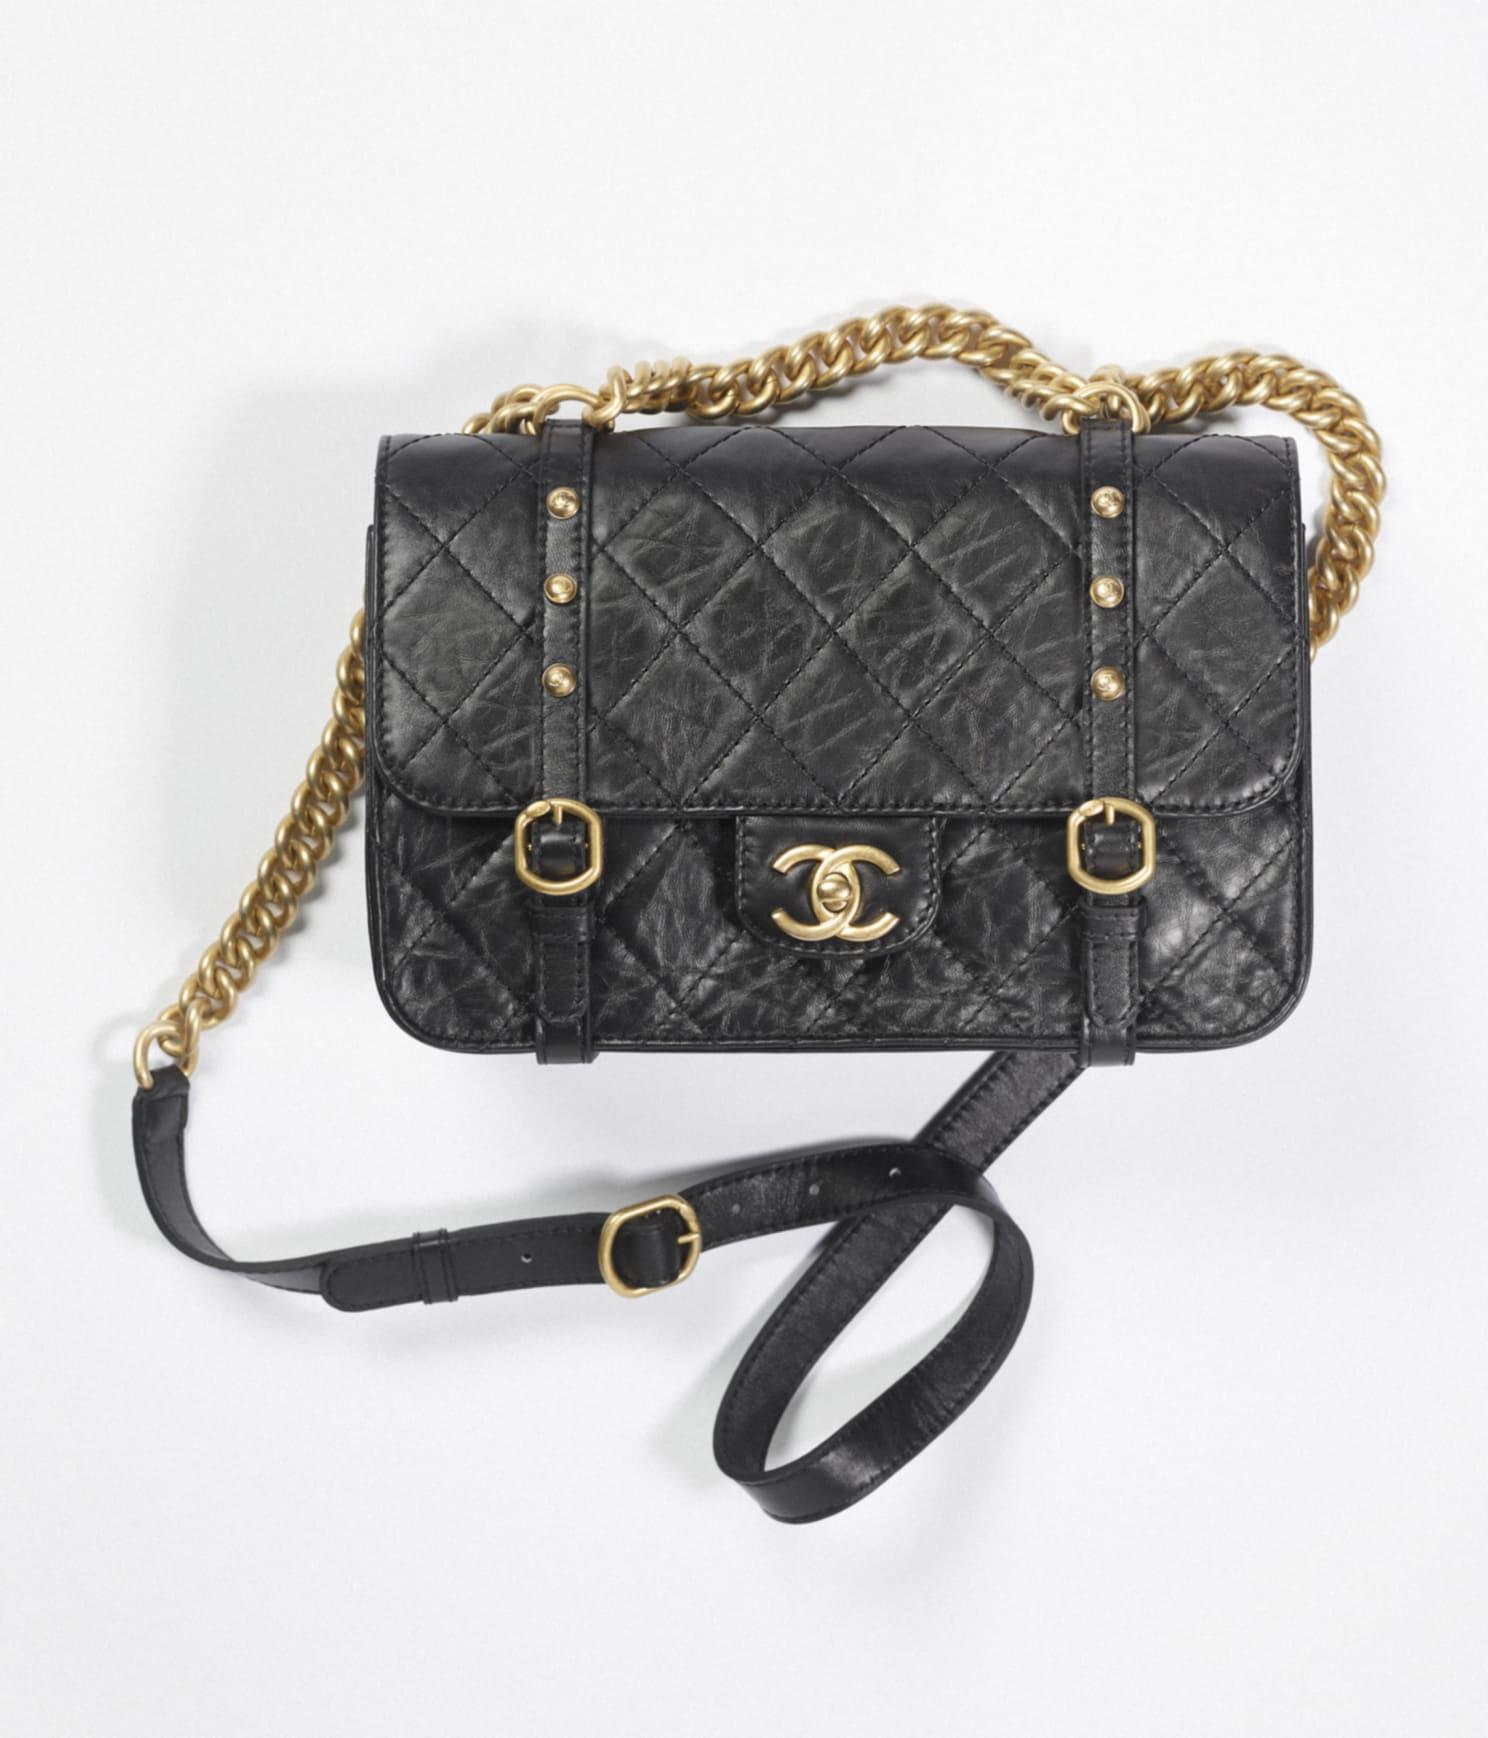 Chanel aged calfskin flap bag